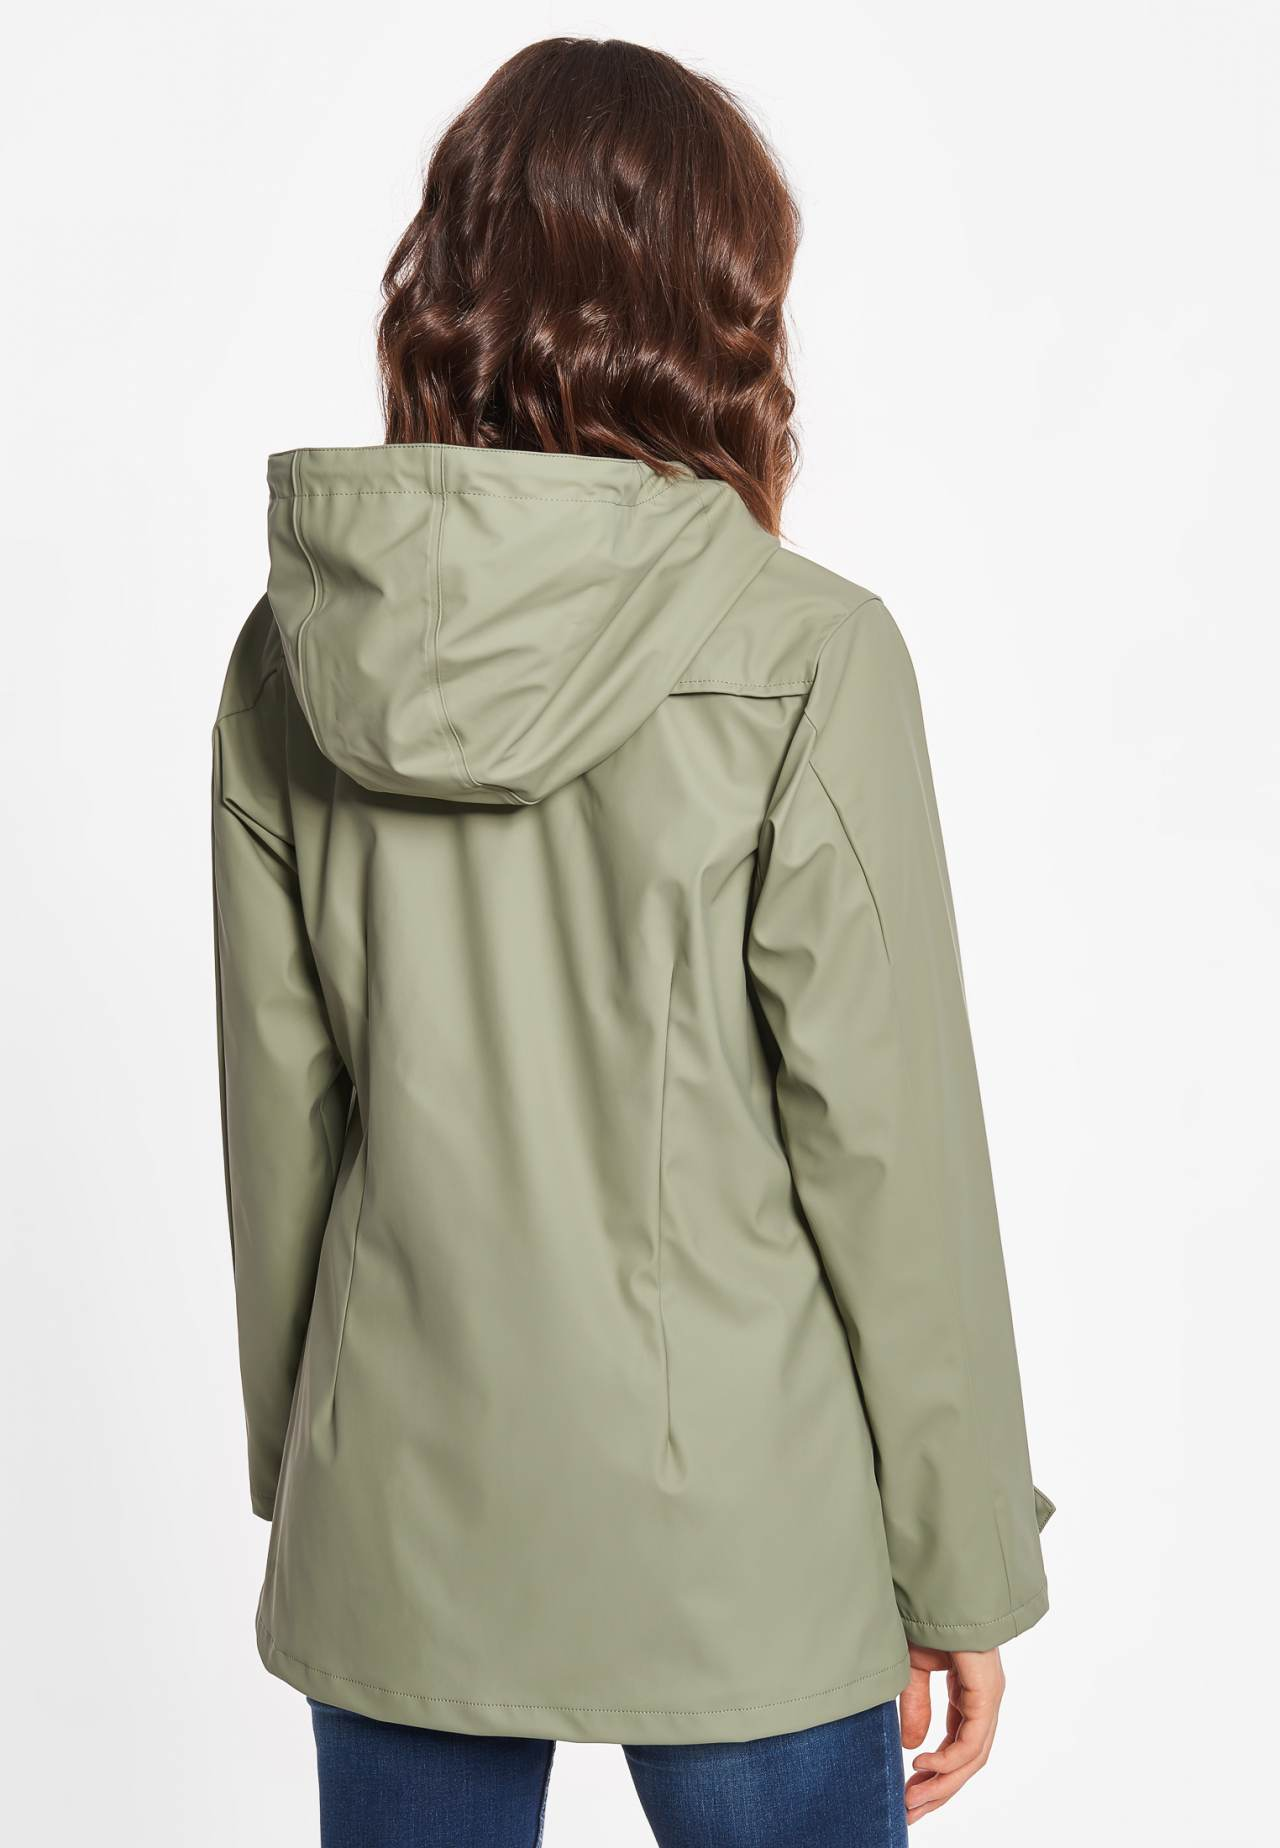 veronika bacher.at derbe 2021 Women Jacket PU W 01 JPU 3100 light olive vichy 020 scaled